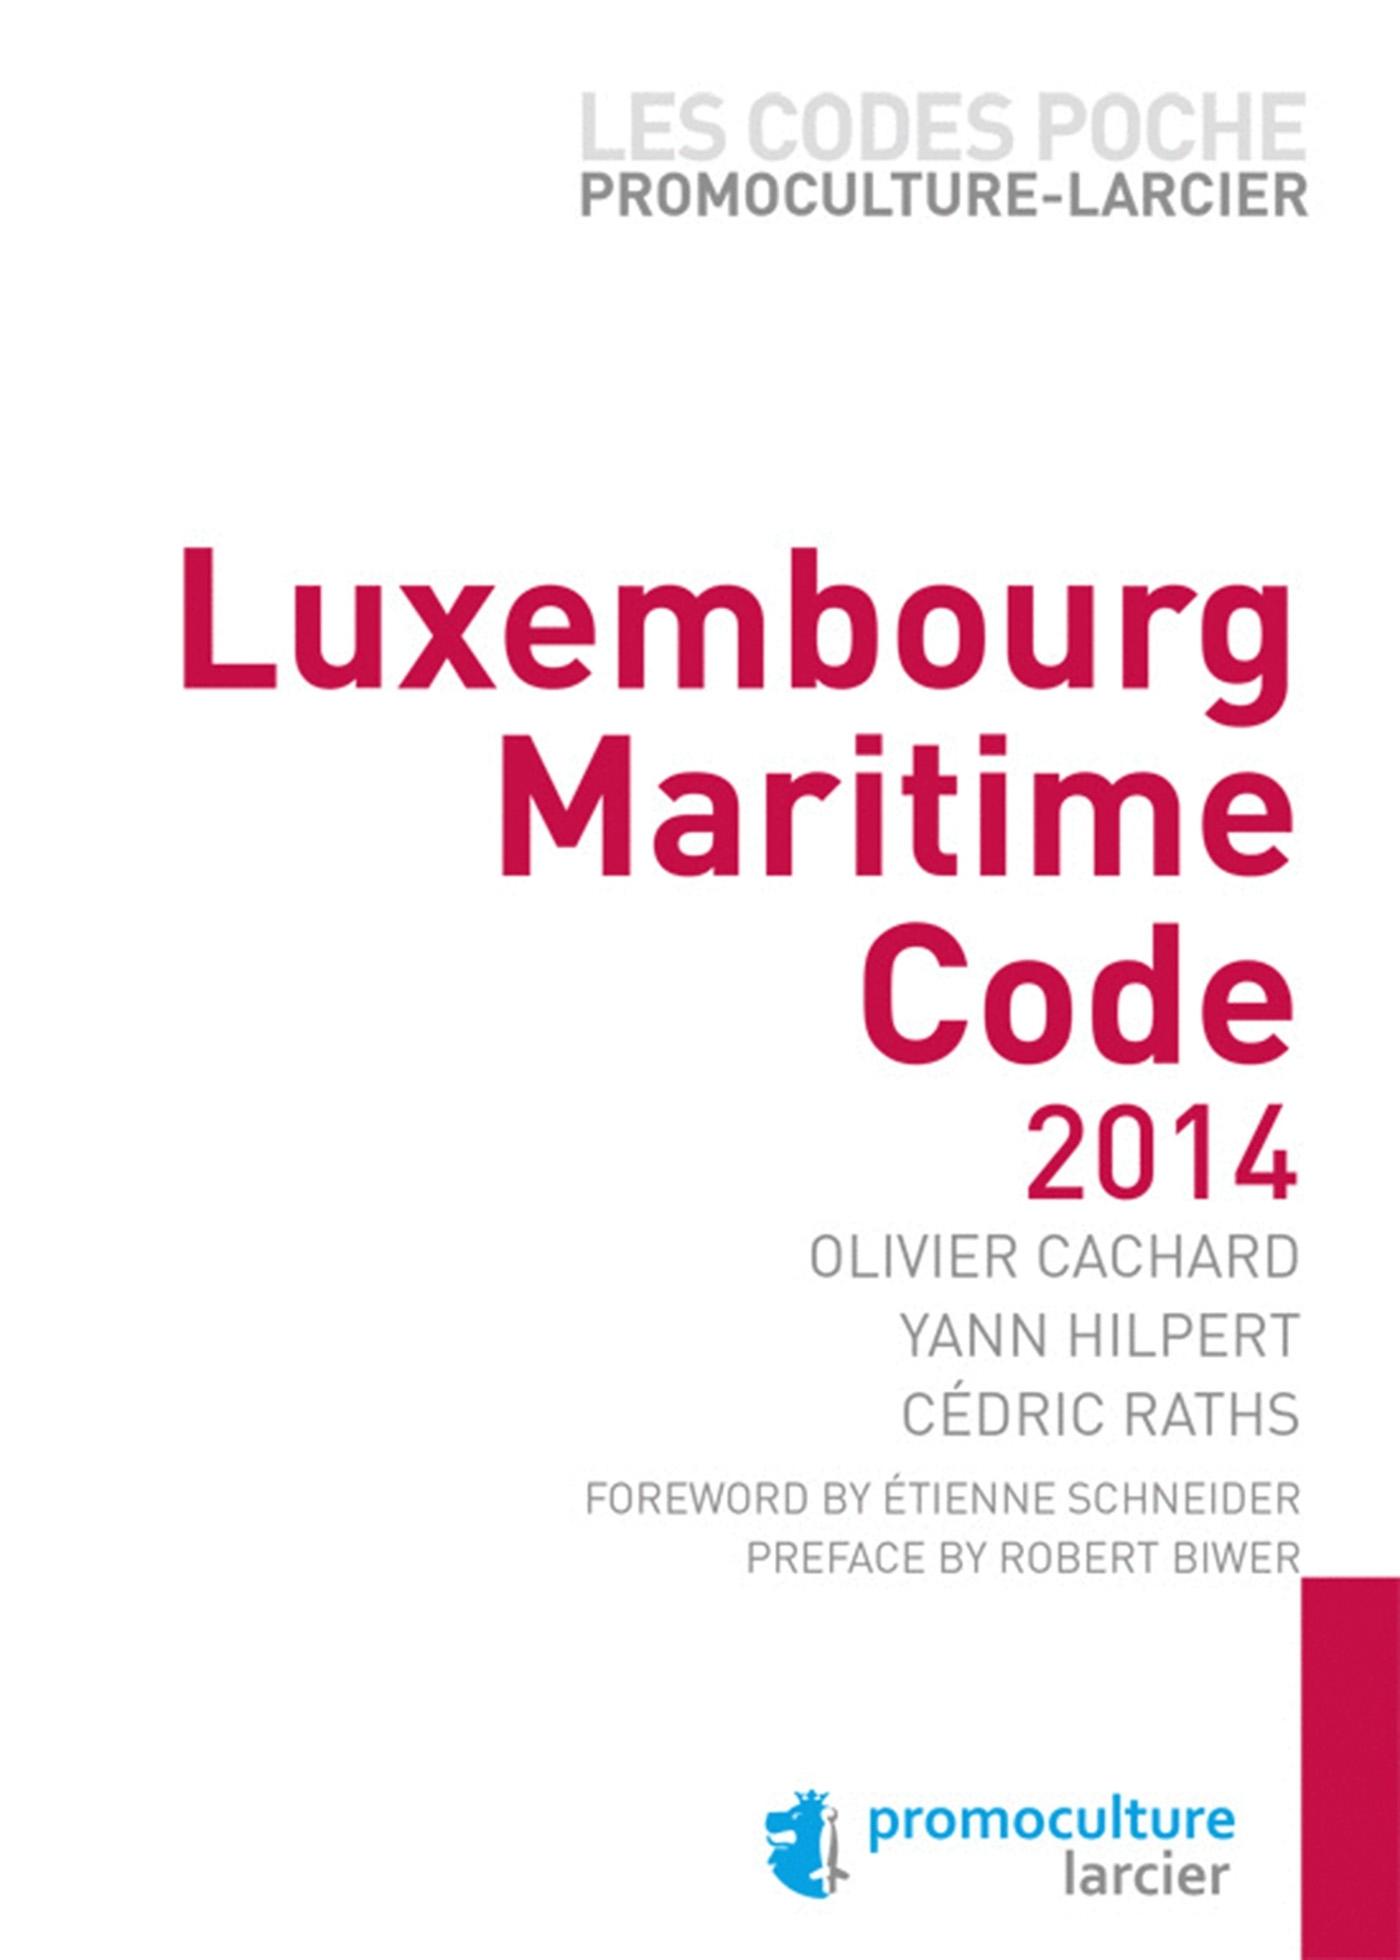 CODE POCHE PROMOCULTURE-LARCIER - LUXEMBOURG MARITIME CODE 2014